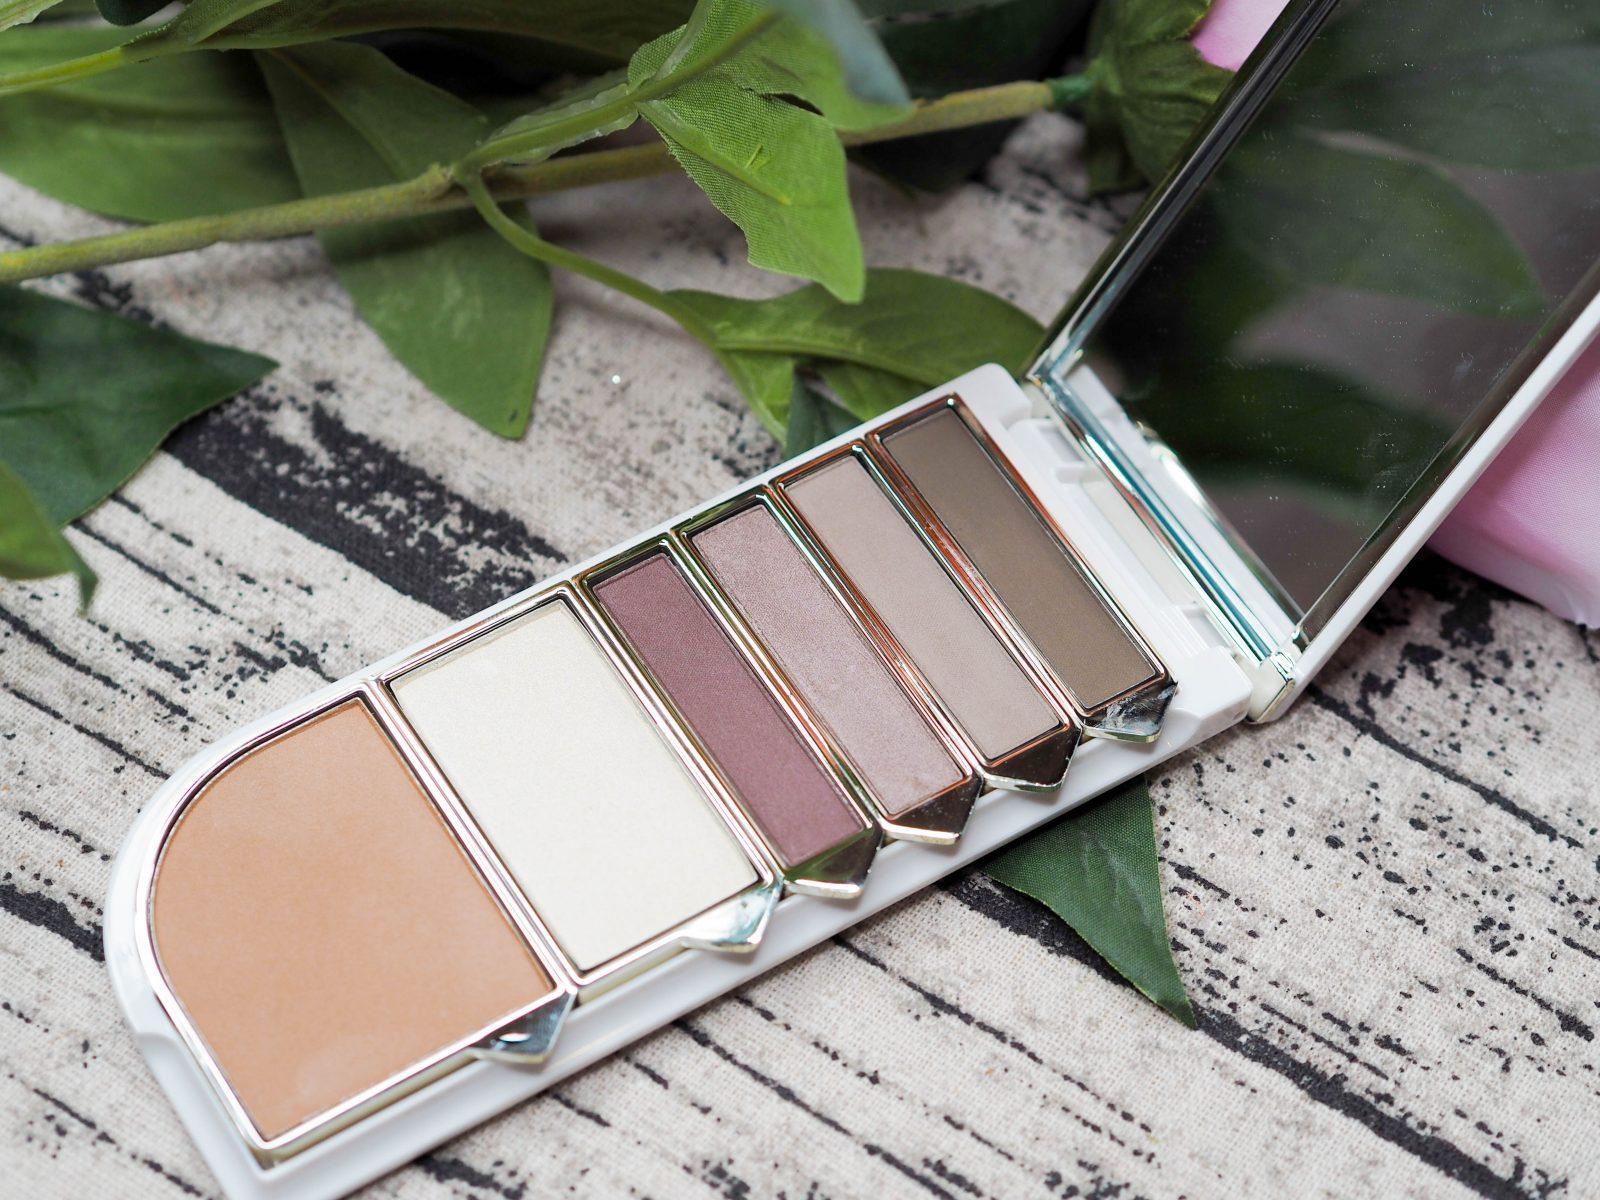 Tropic Colour Palette: Full Review - Beauty Geek UK